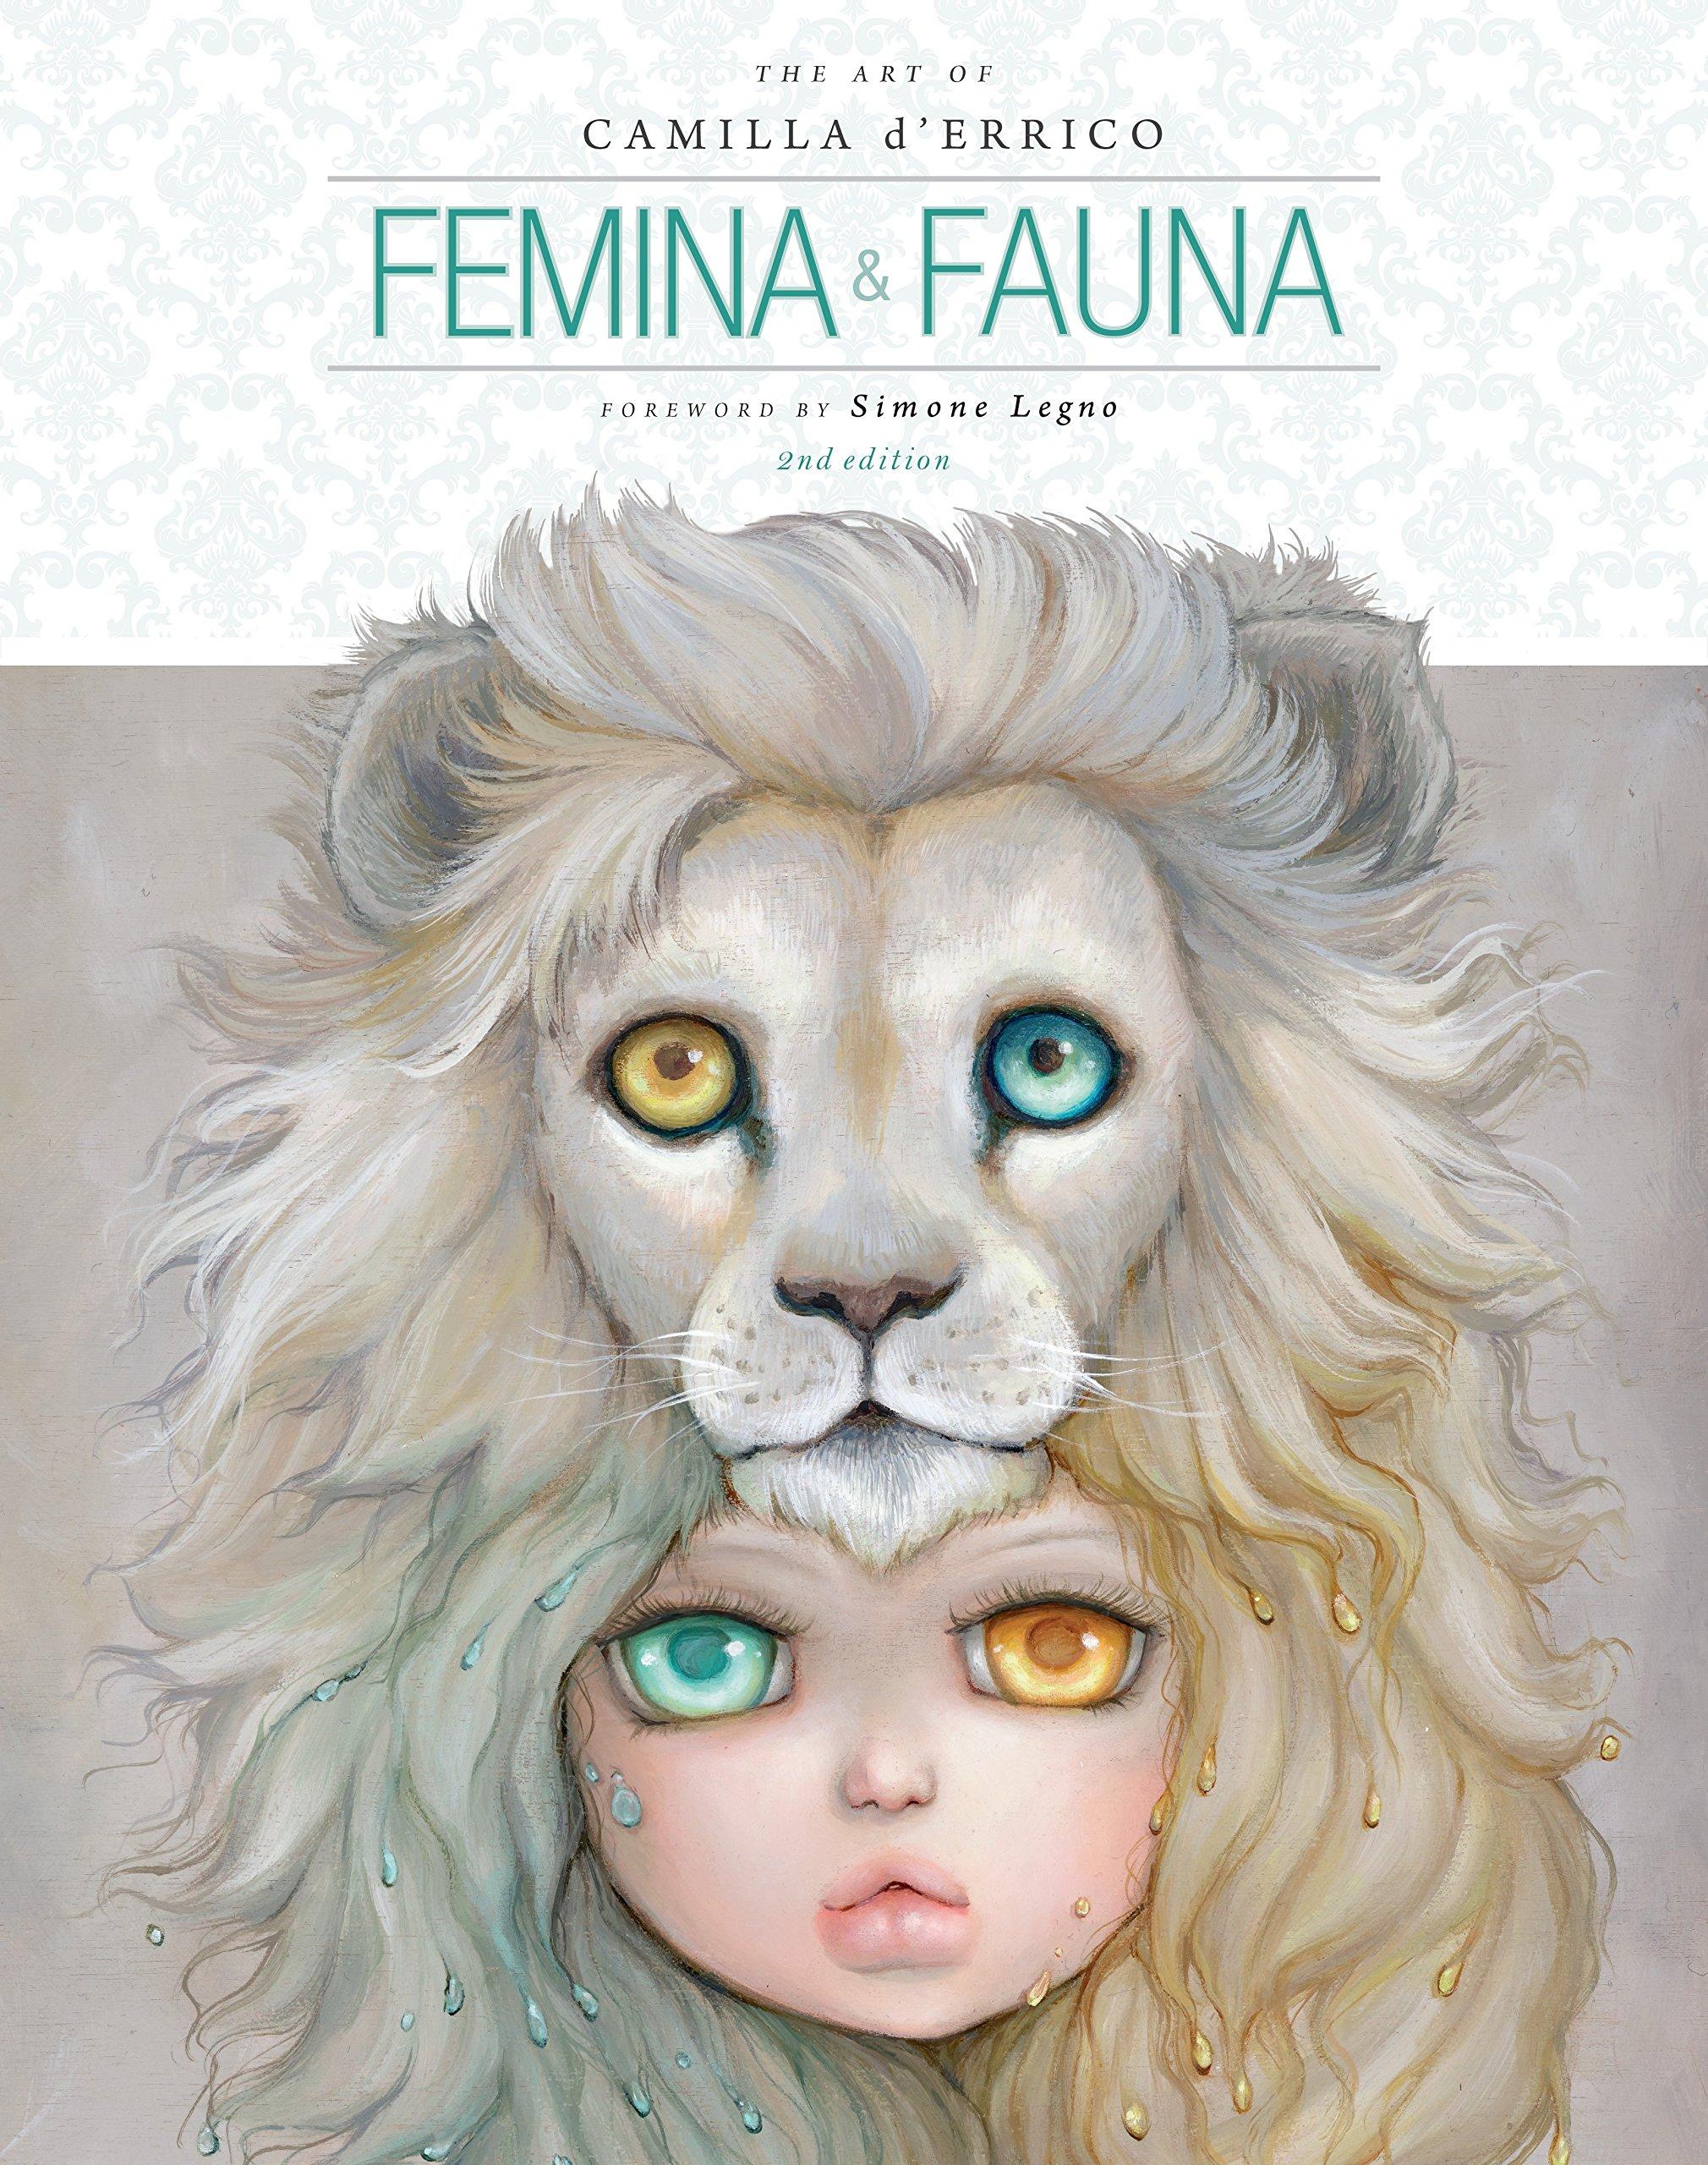 Download Femina and Fauna: The Art of Camilla d'Errico (Second Edition) PDF